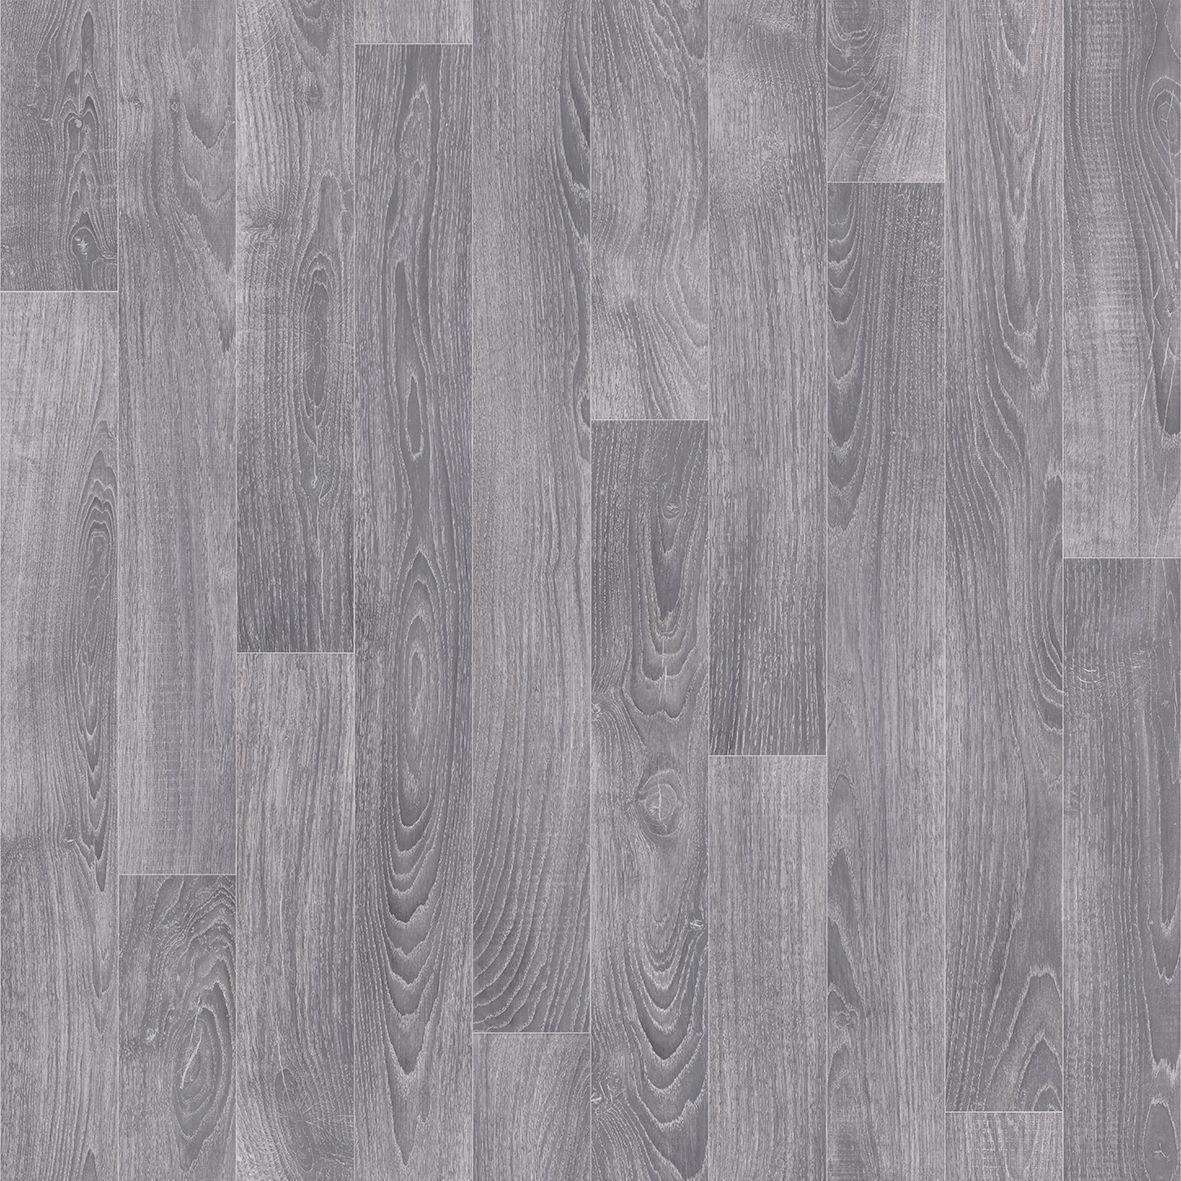 Grey Oak Effect Vinyl Flooring 4m²